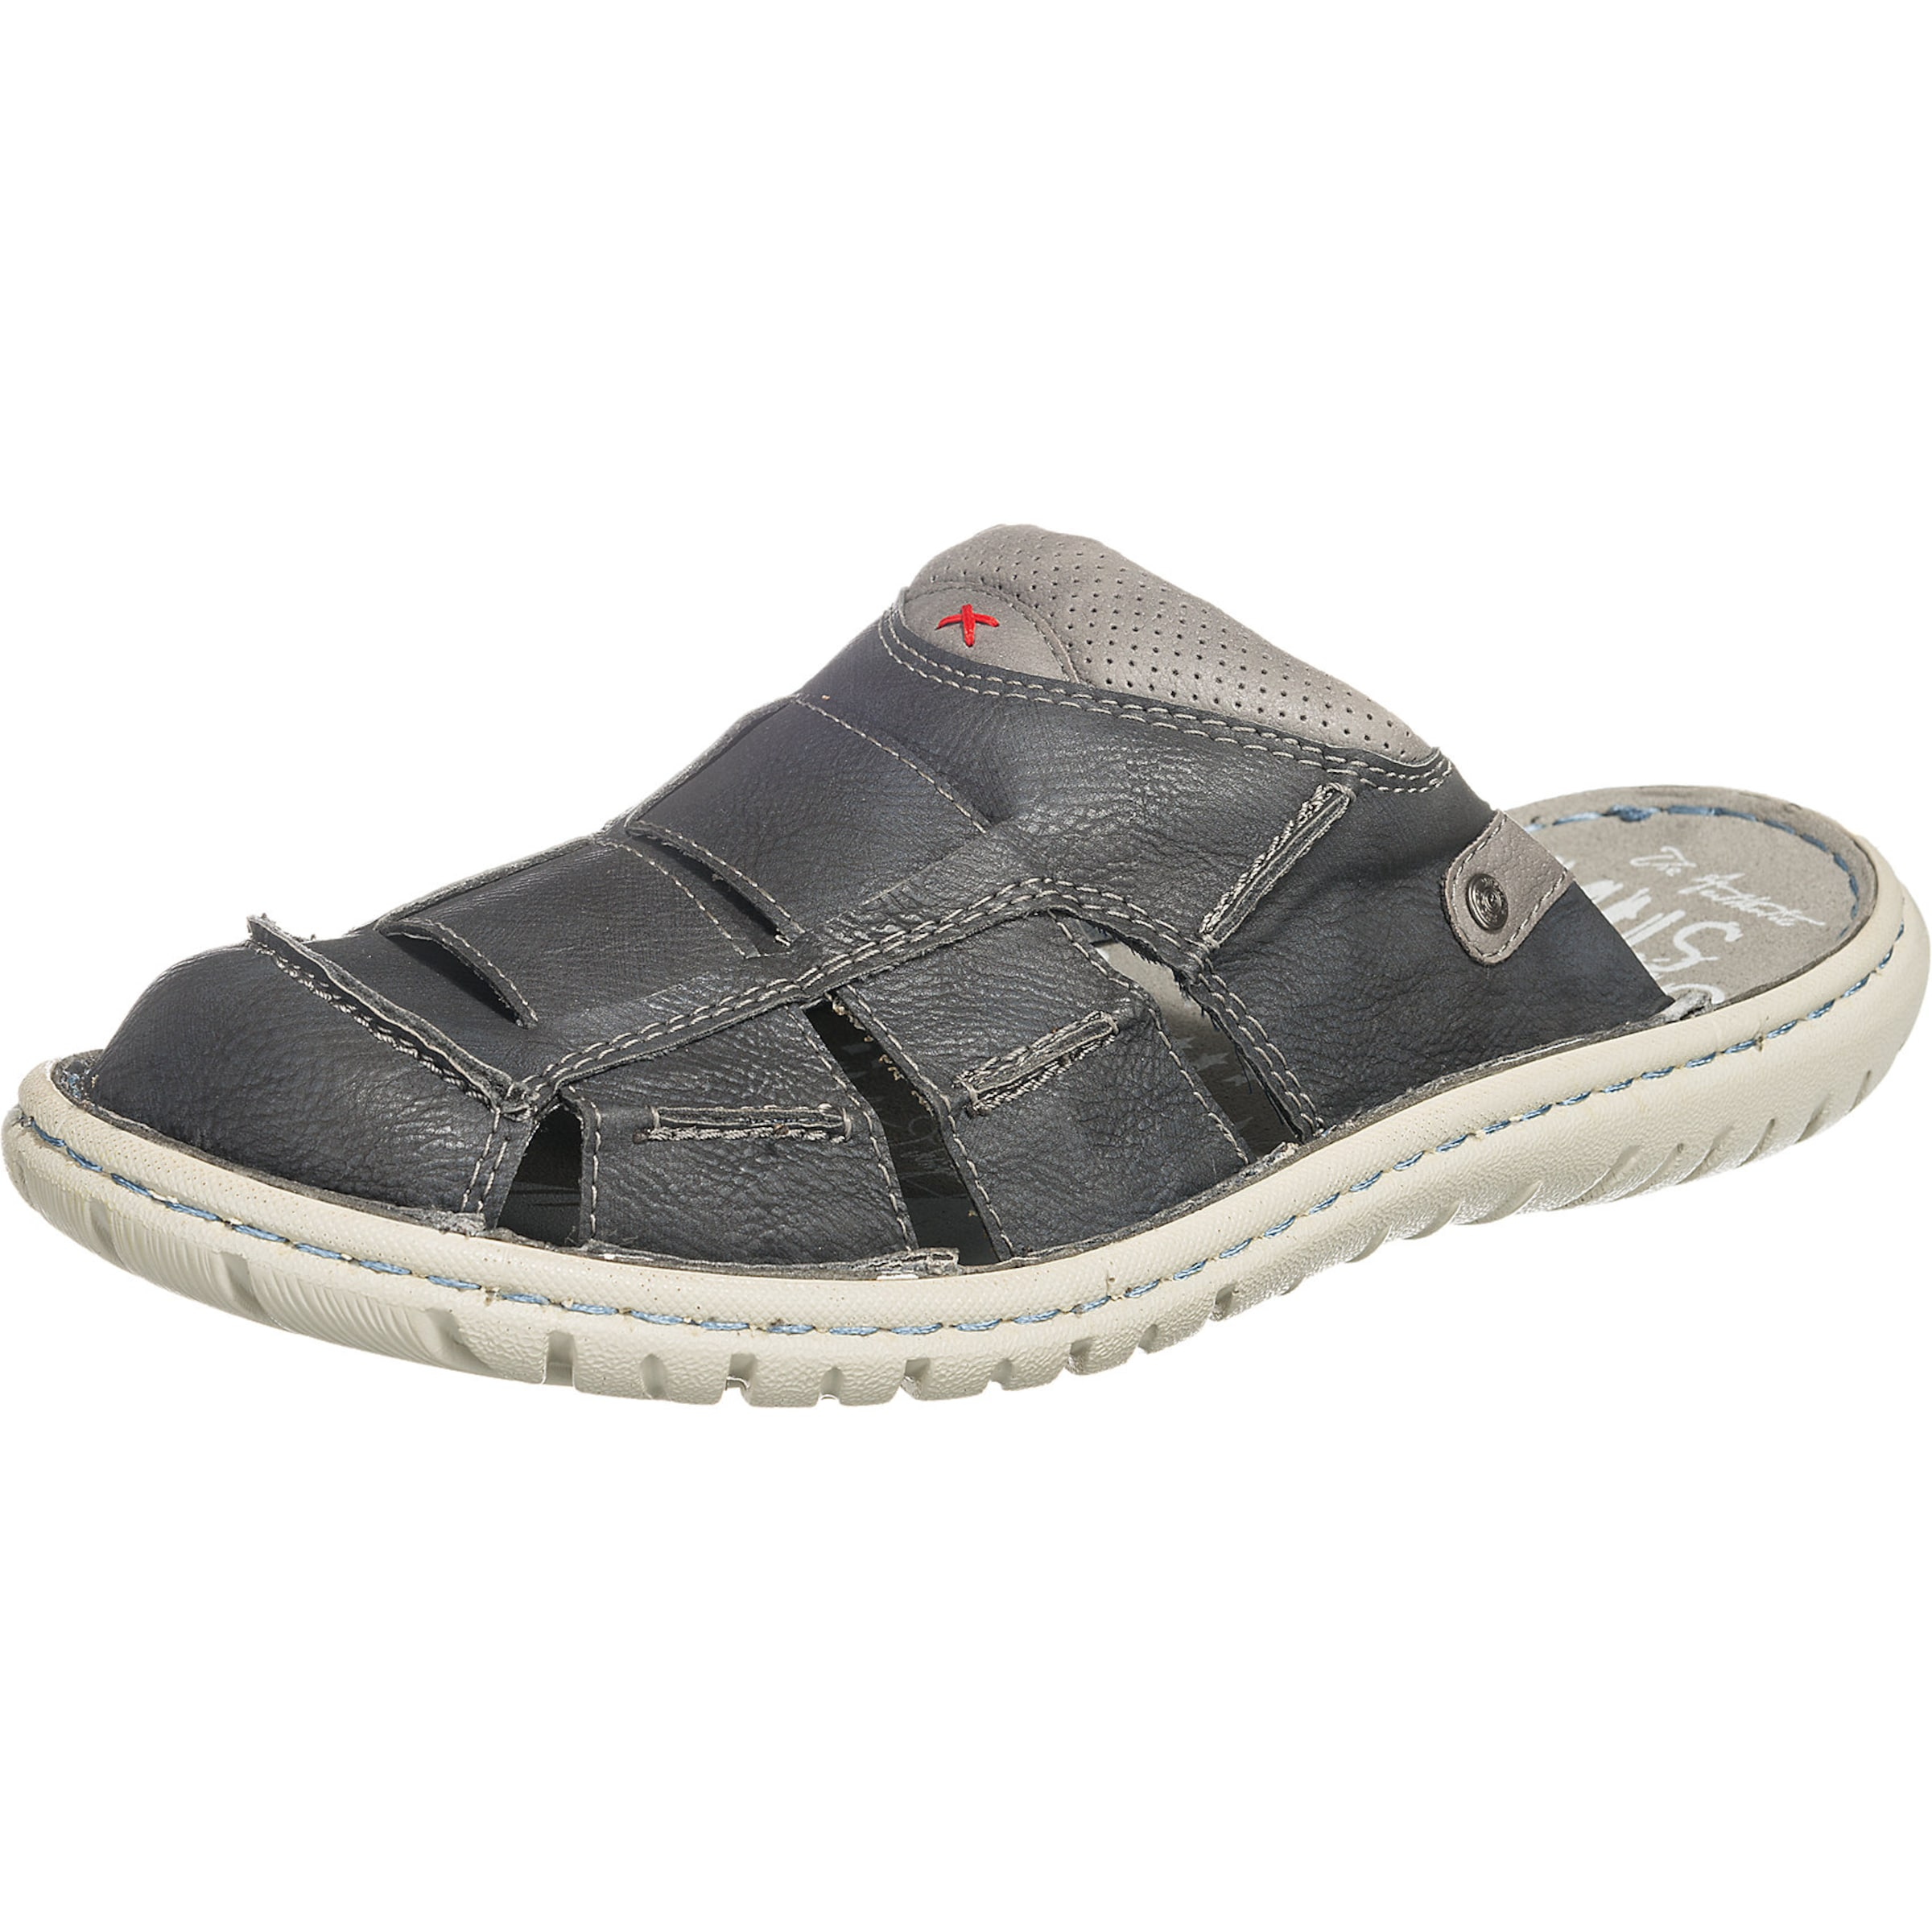 MUSTANG Clogs Verschleißfeste billige Schuhe Hohe Qualität